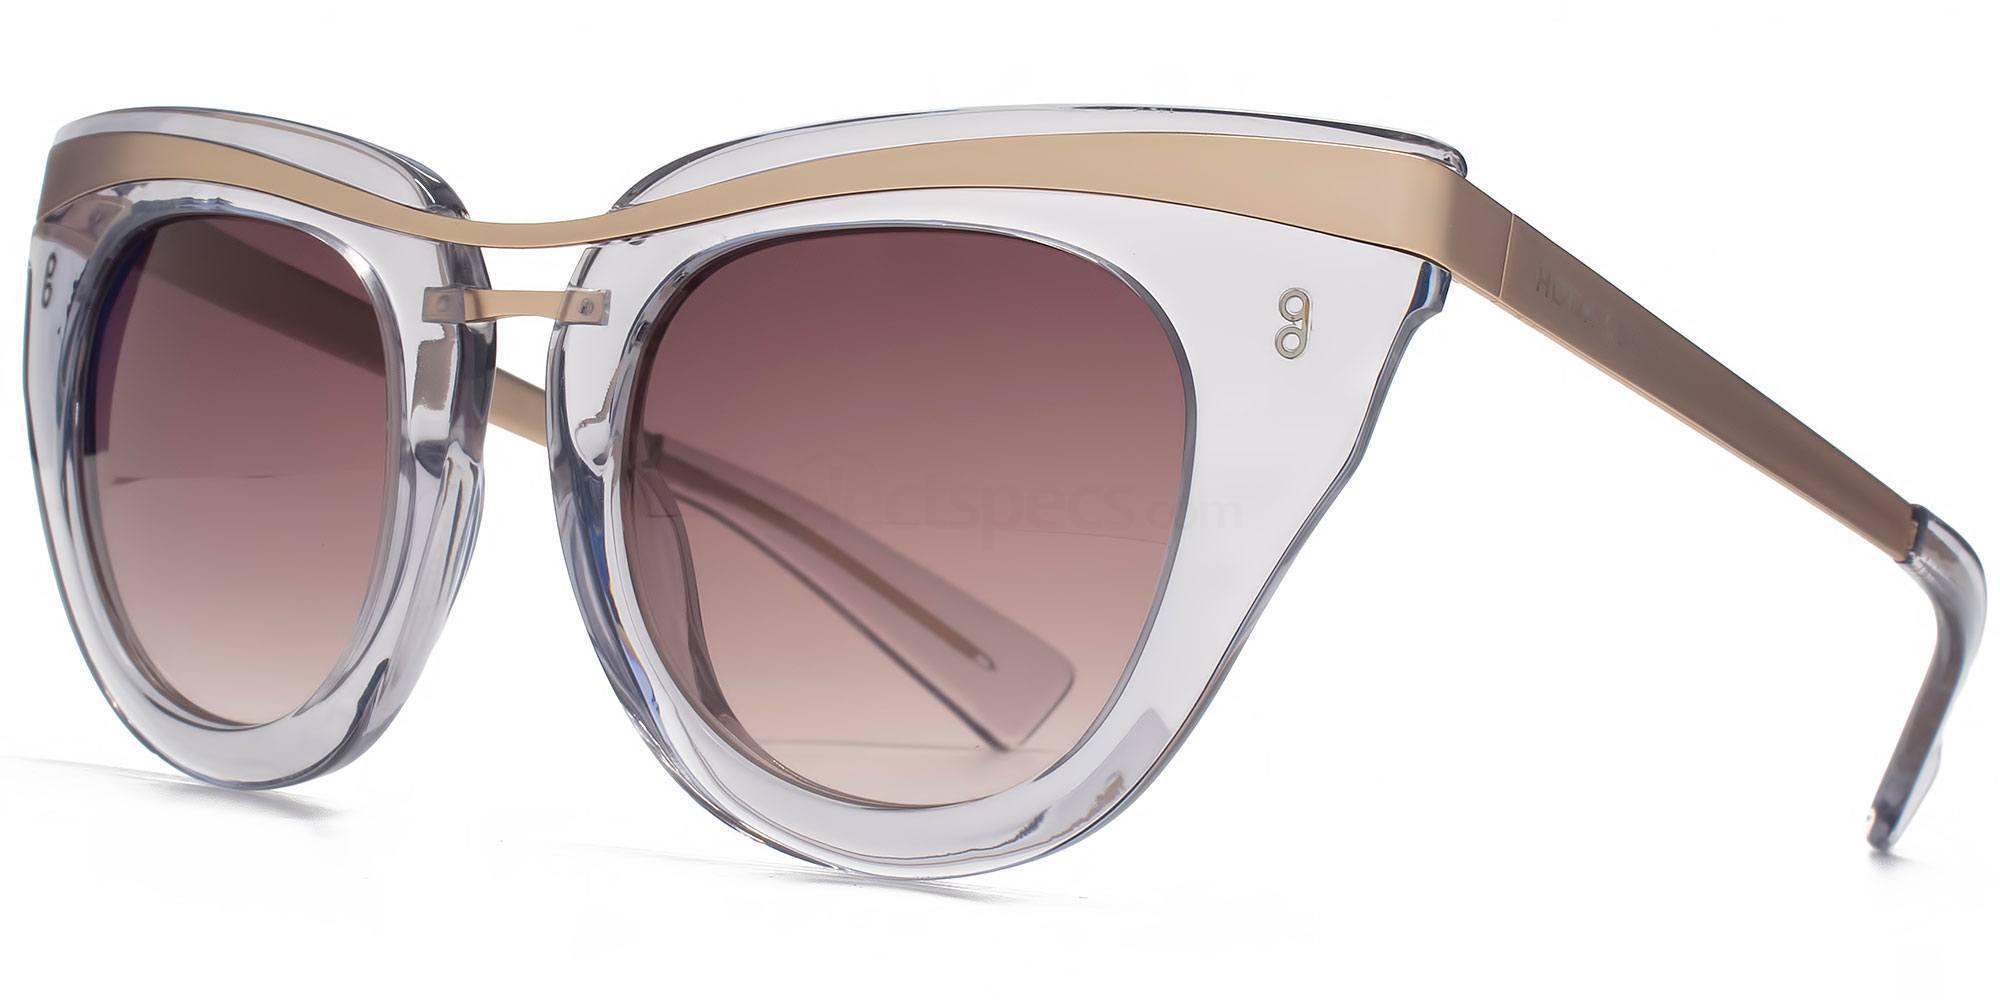 GRY HK010 - CLIQUE Sunglasses, Hook LDN